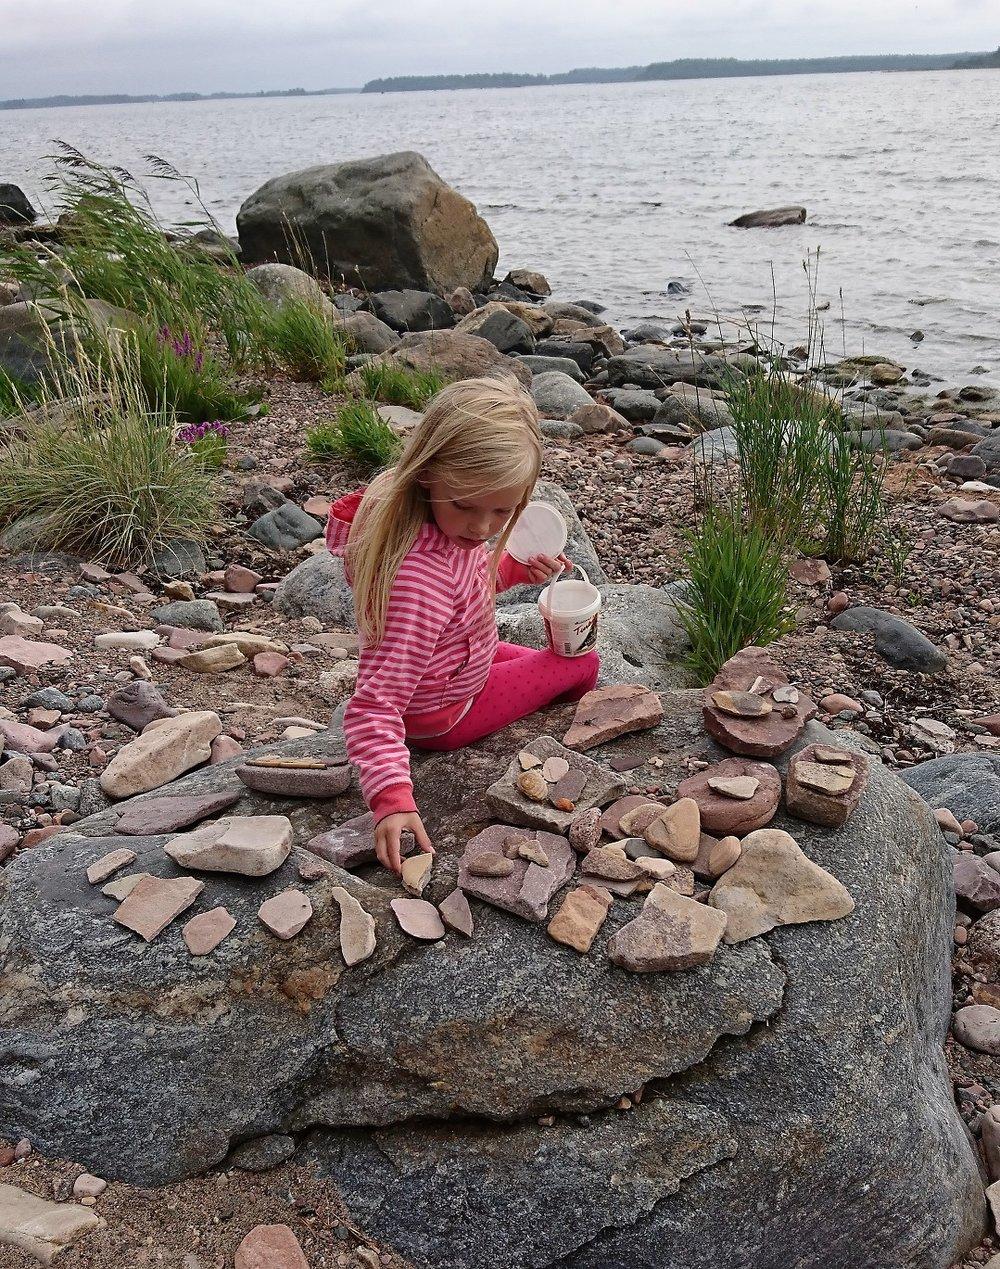 Lumi grounding with stones